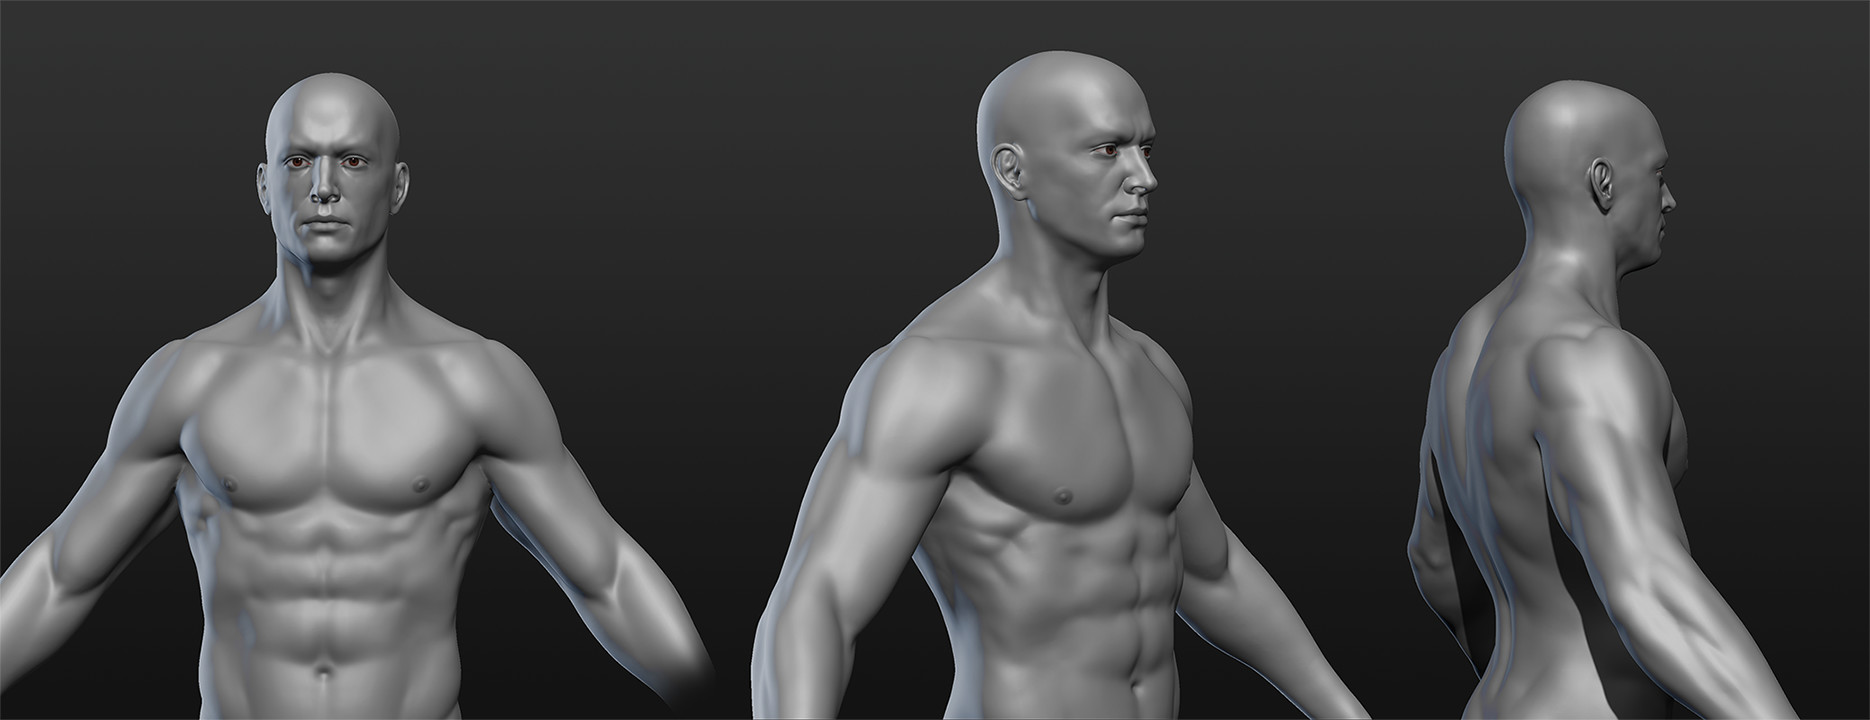 Stefan polster torso